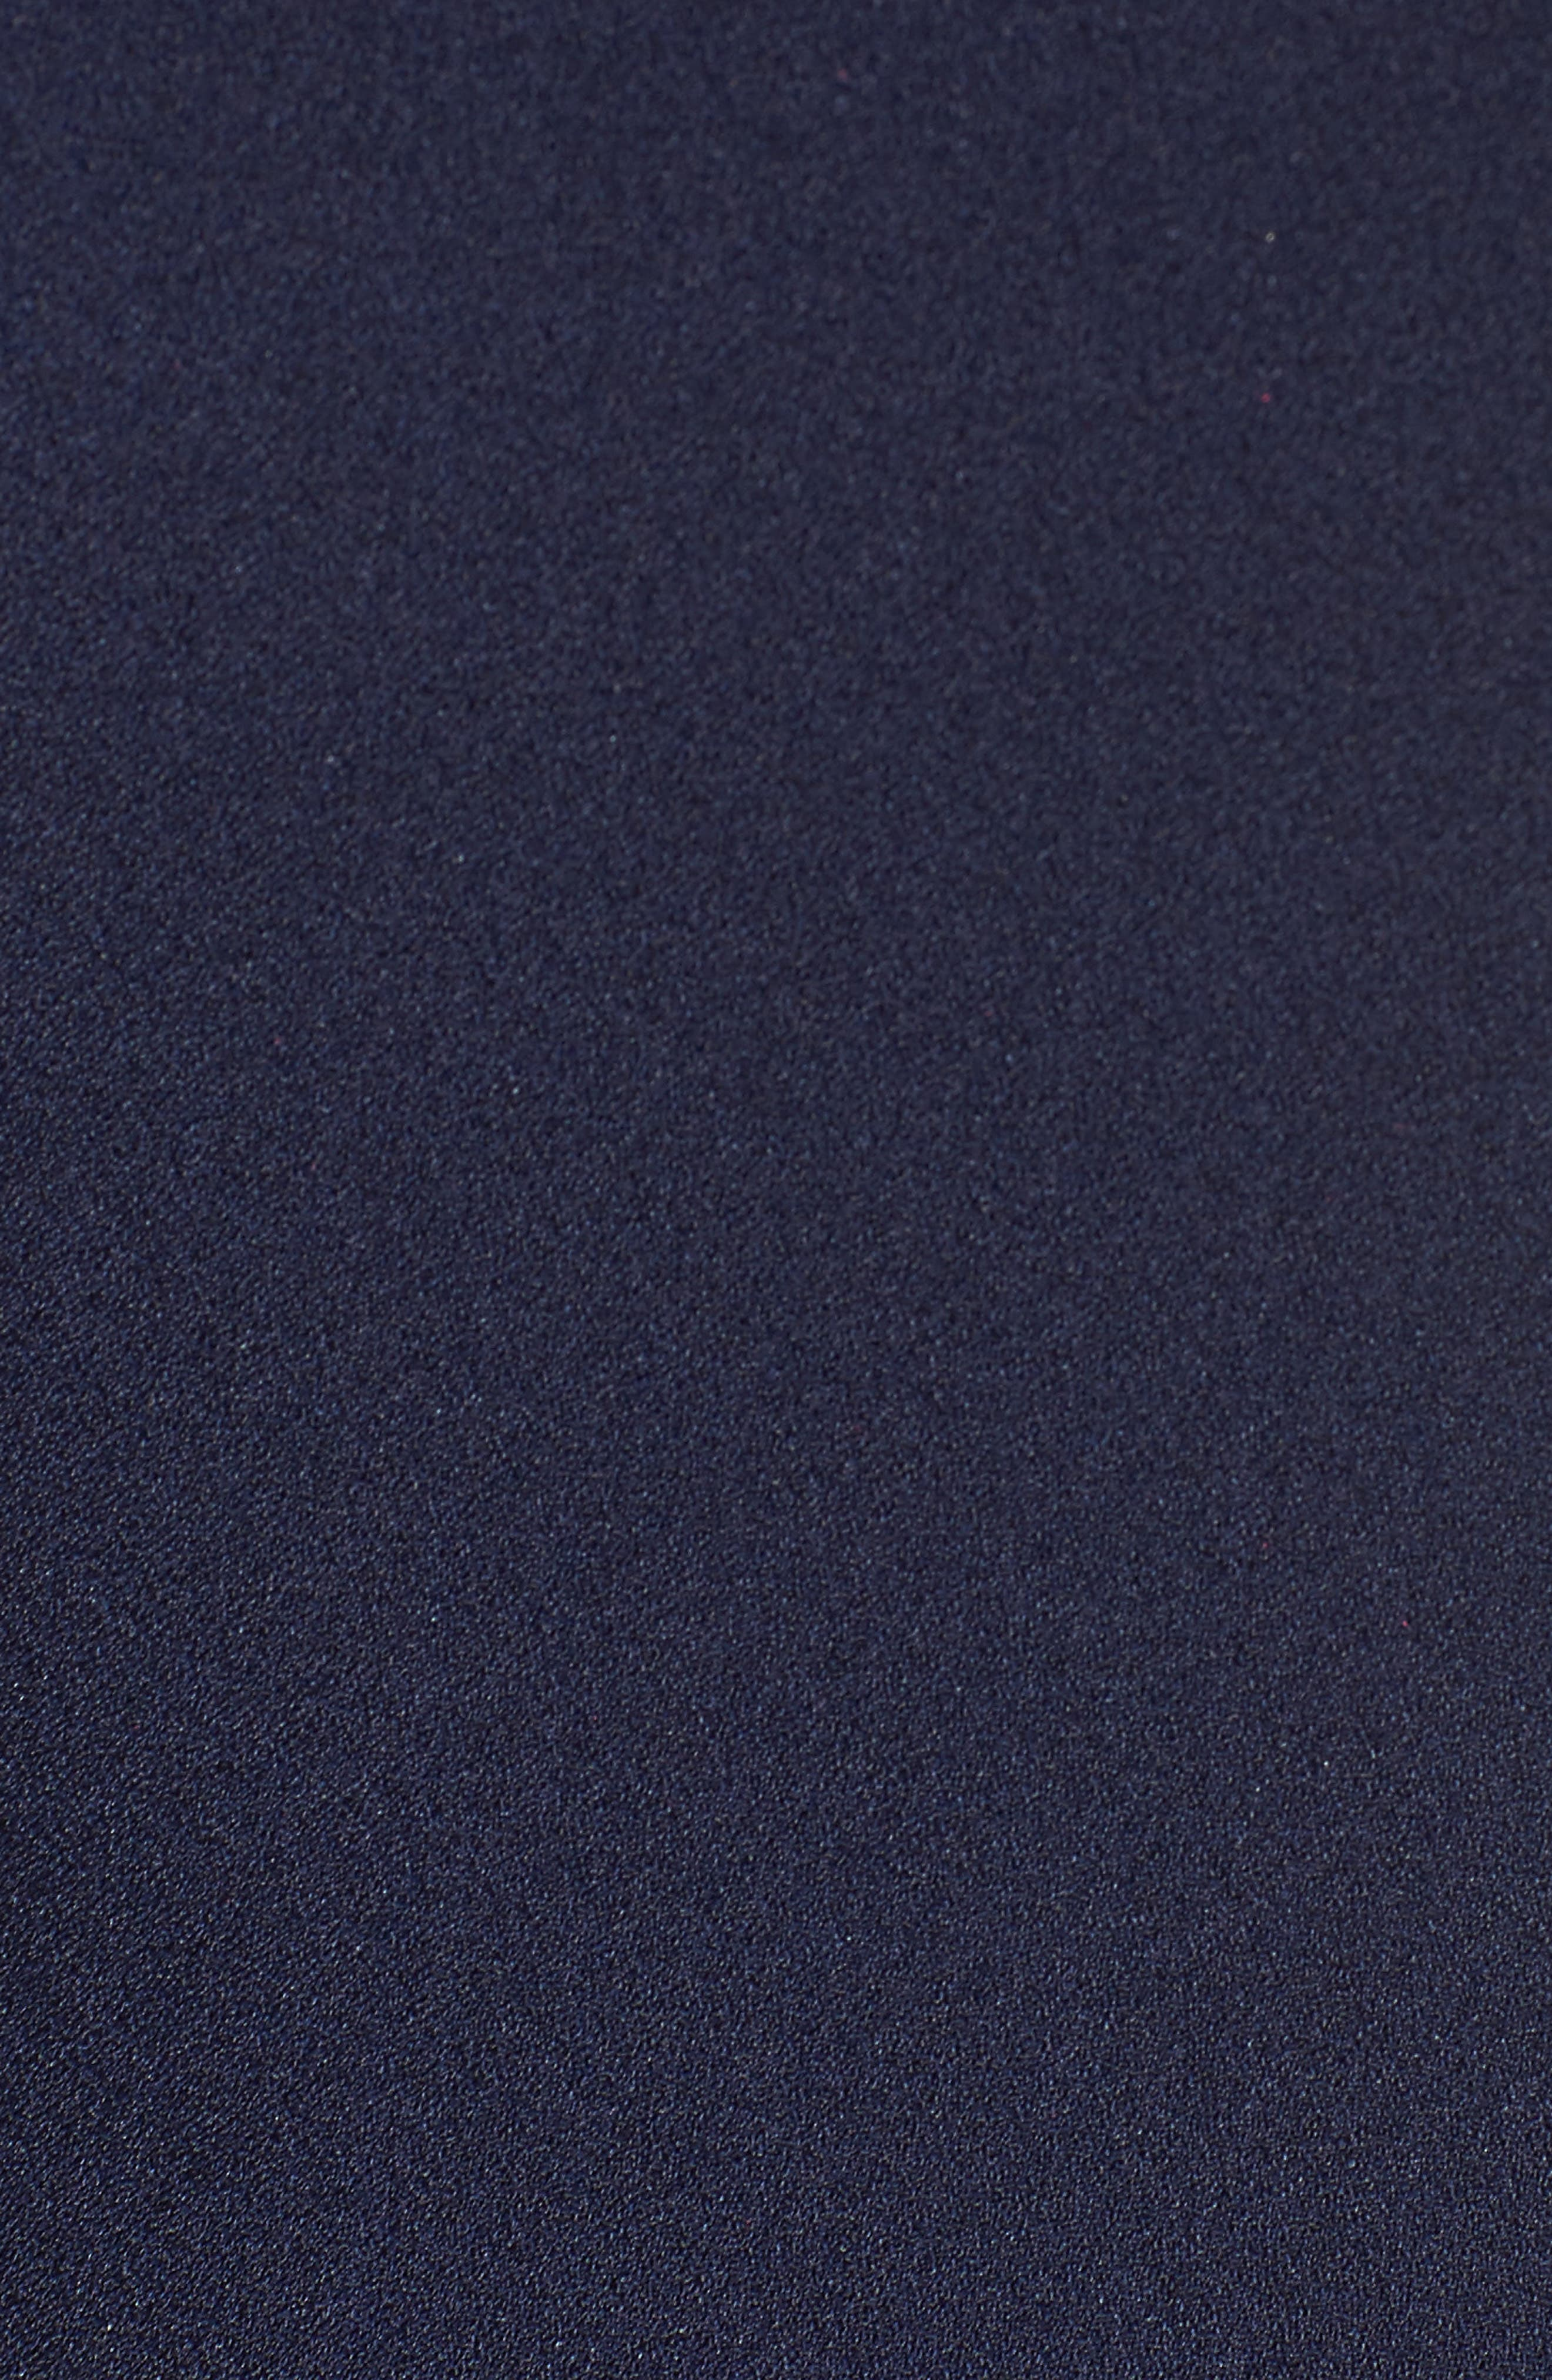 Off the Shoulder Sheath Dress,                             Alternate thumbnail 5, color,                             Navy